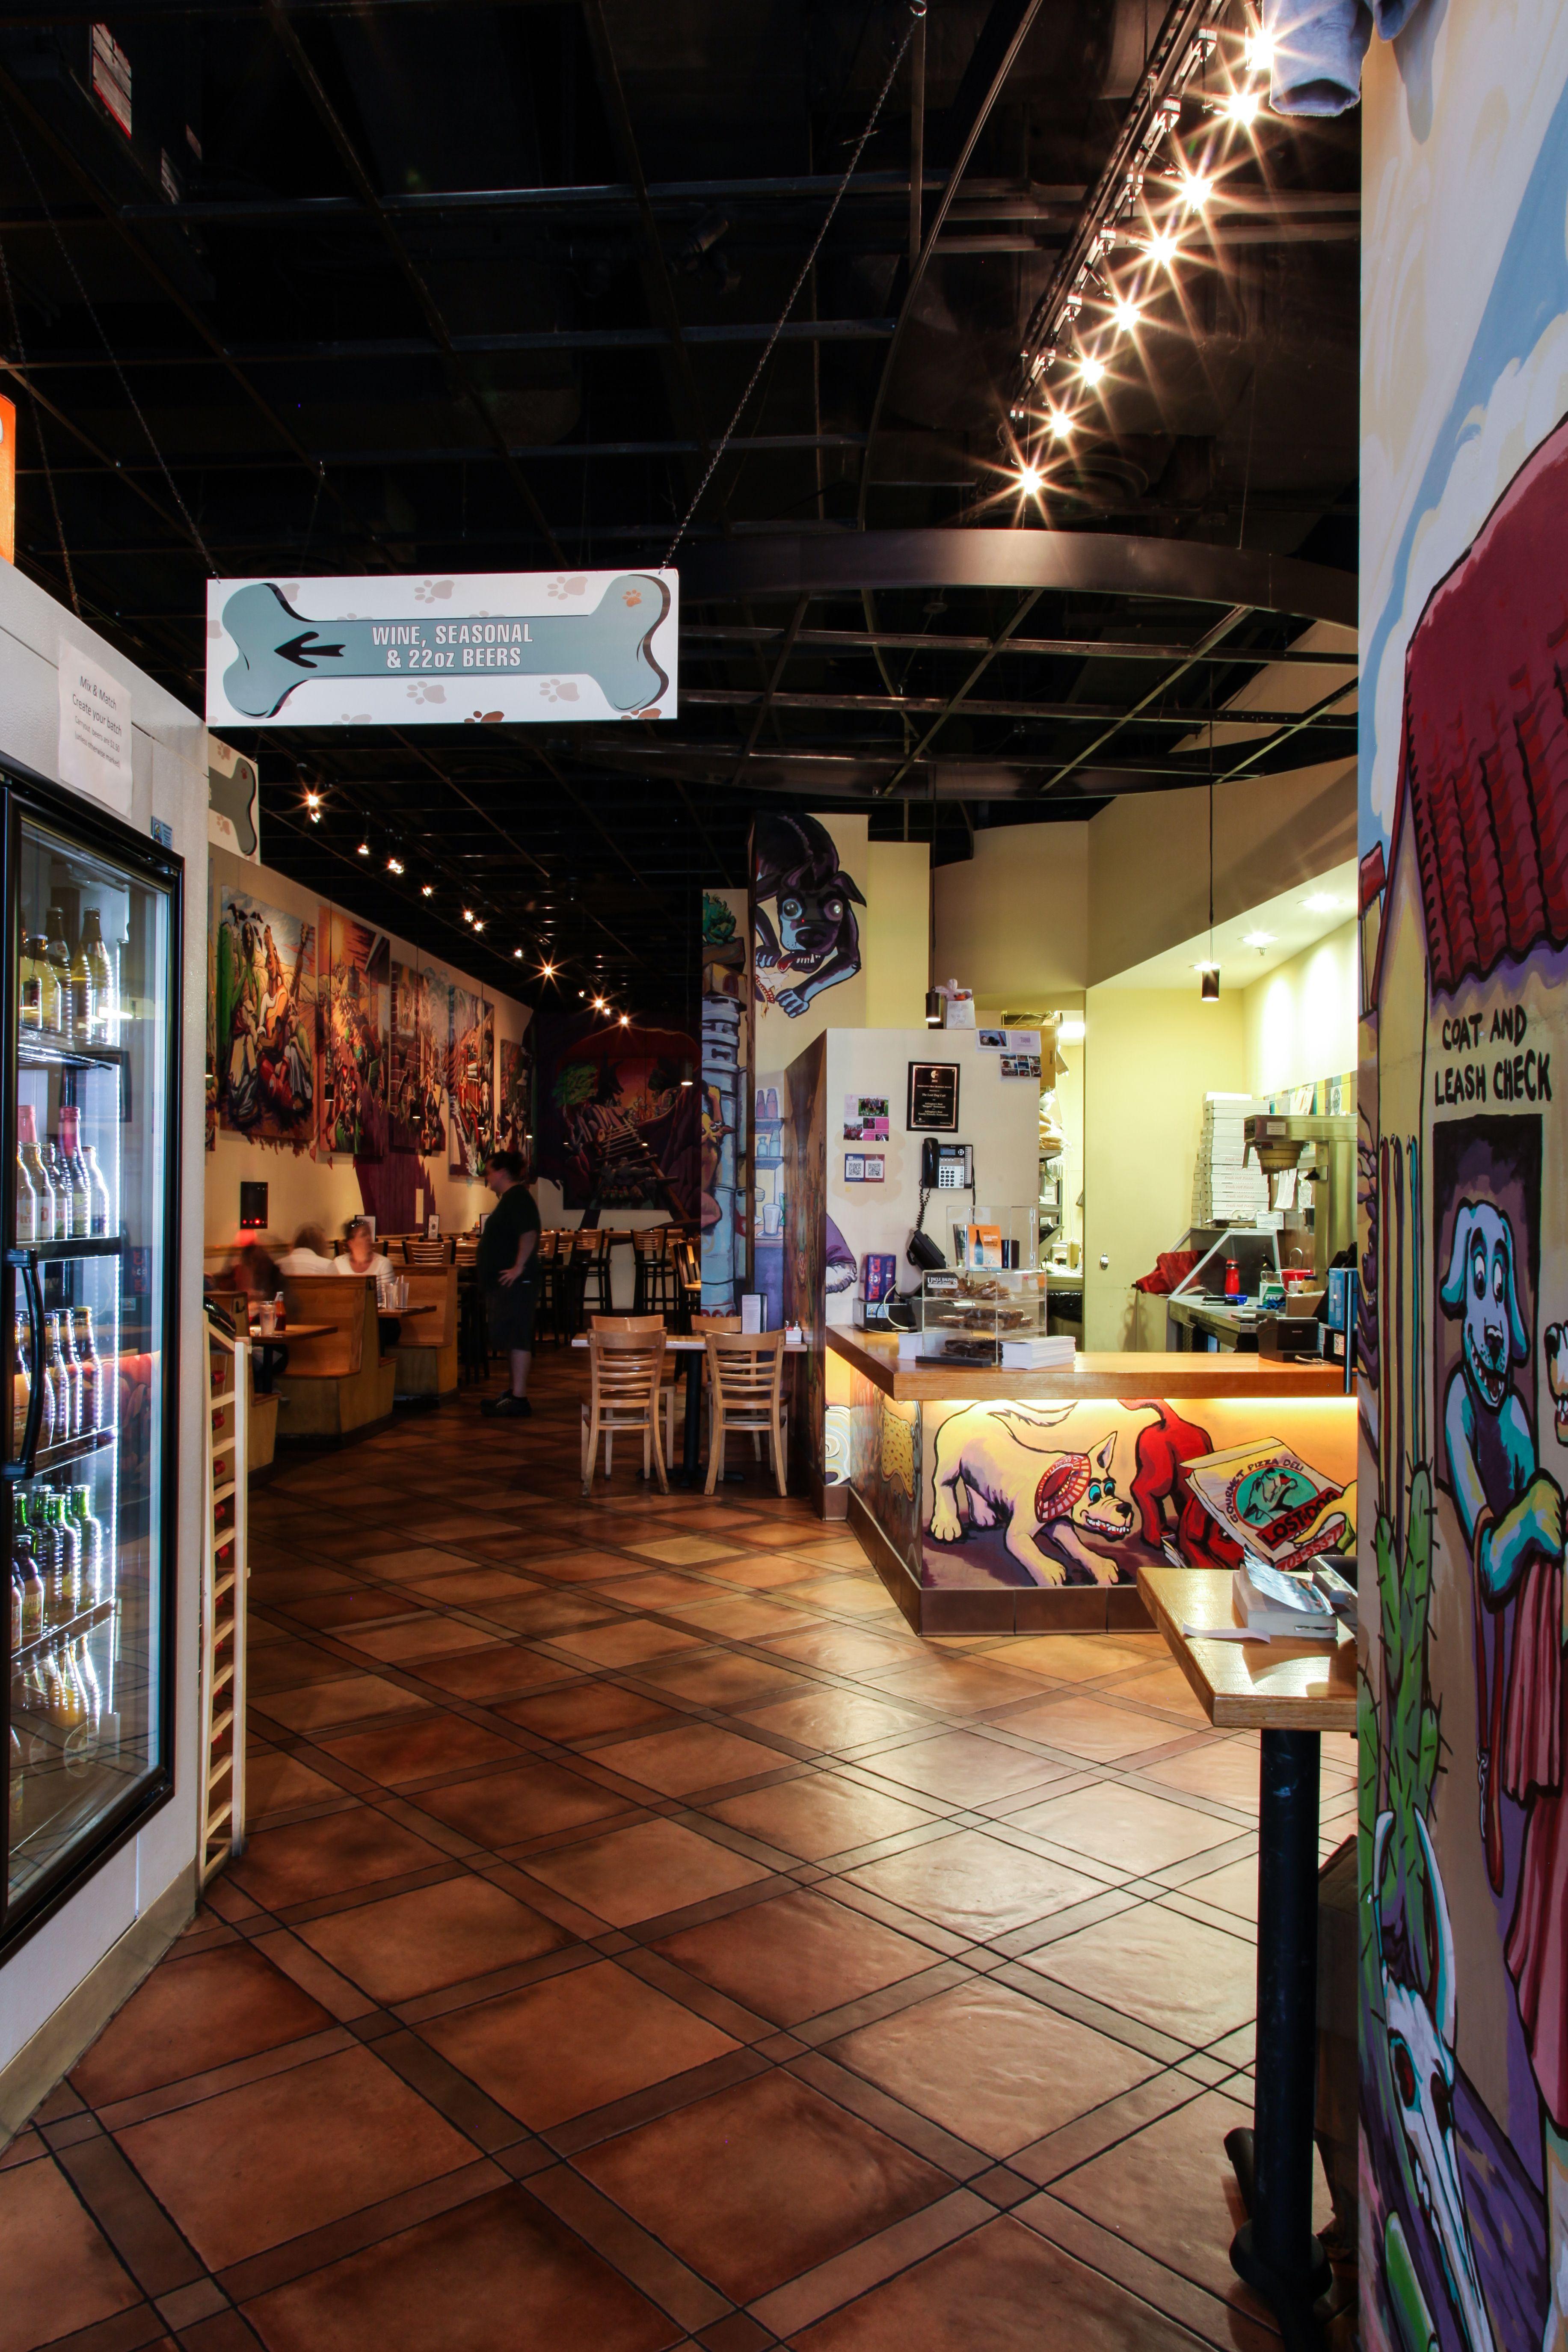 Lost Dog Cafe - South Arlington - Entry/ Host station